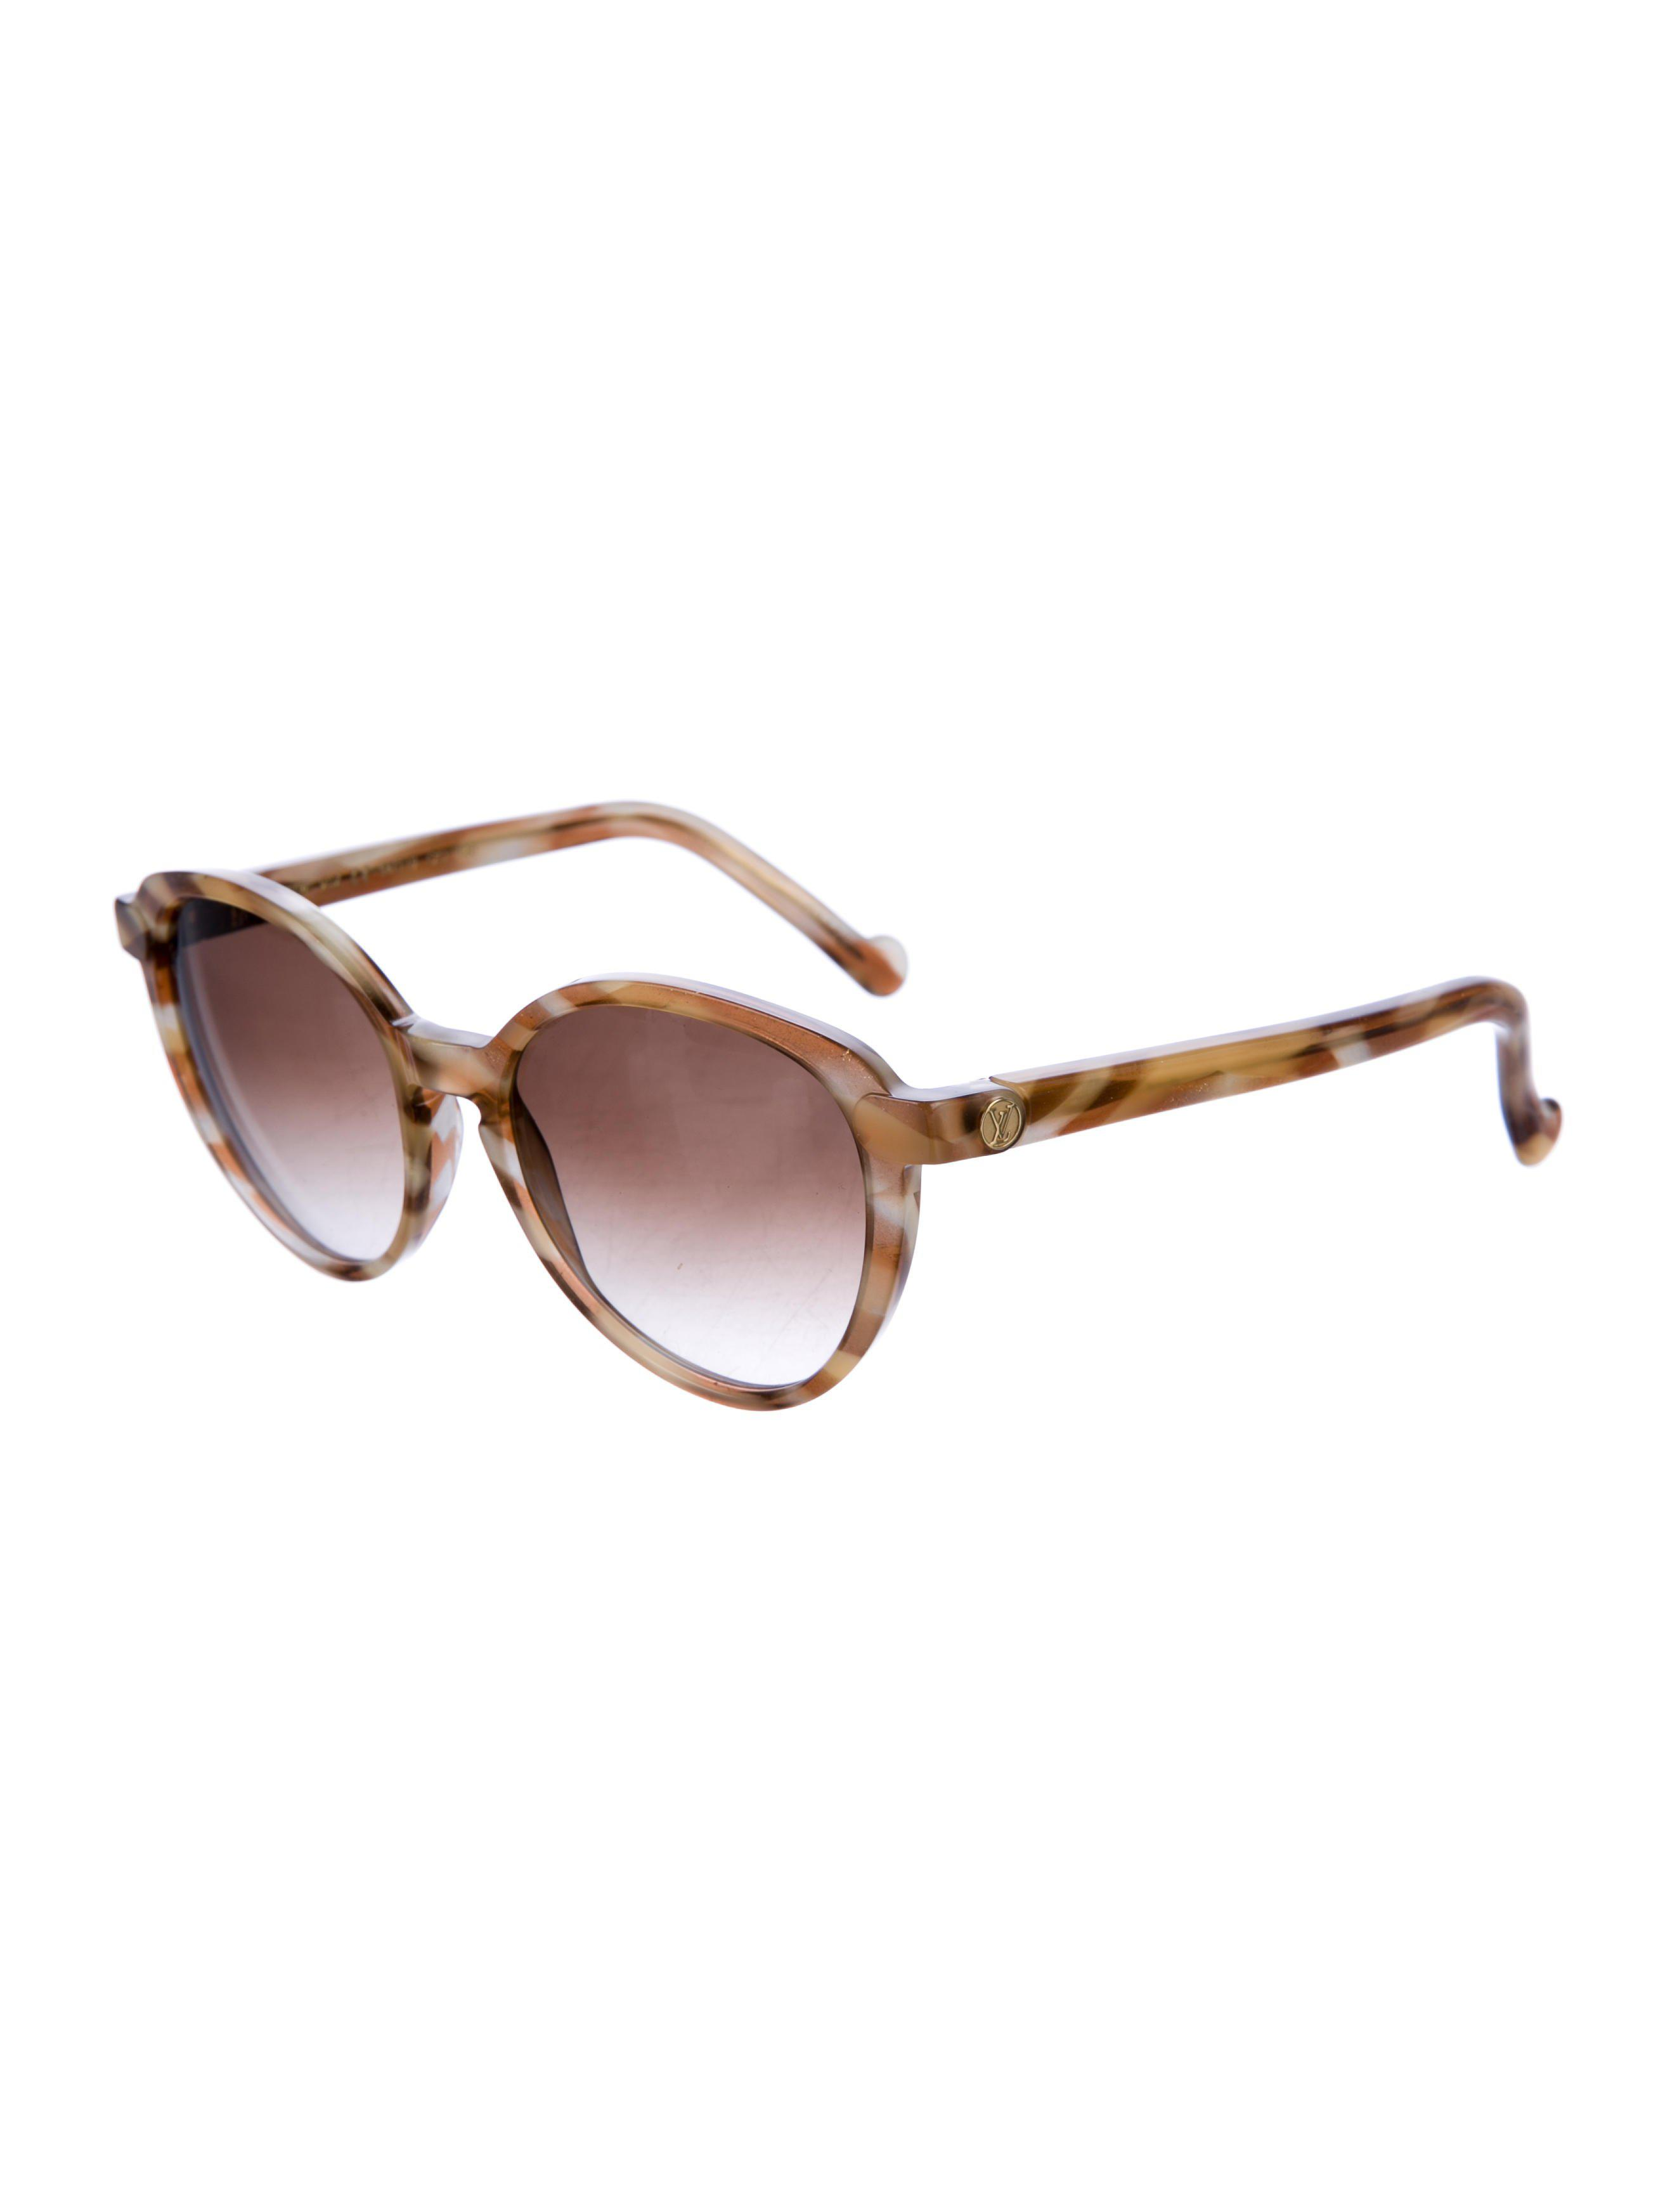 47460eafa1f6 Lyst louis vuitton ava round sunglasses honey in yellow jpg 2645x3489 Ava  louis vuitton sunglasses